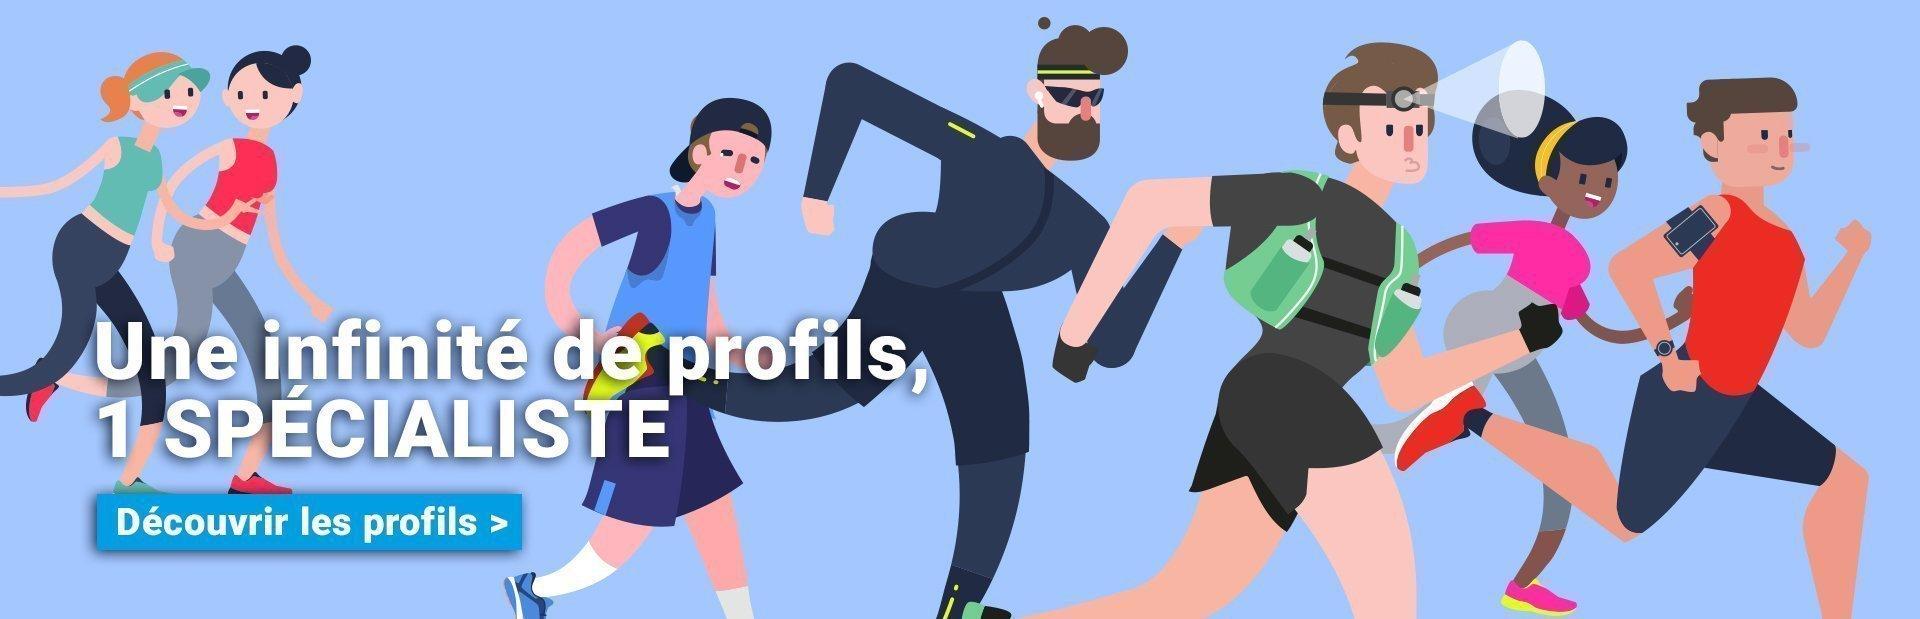 Une infinité de profils running conseil